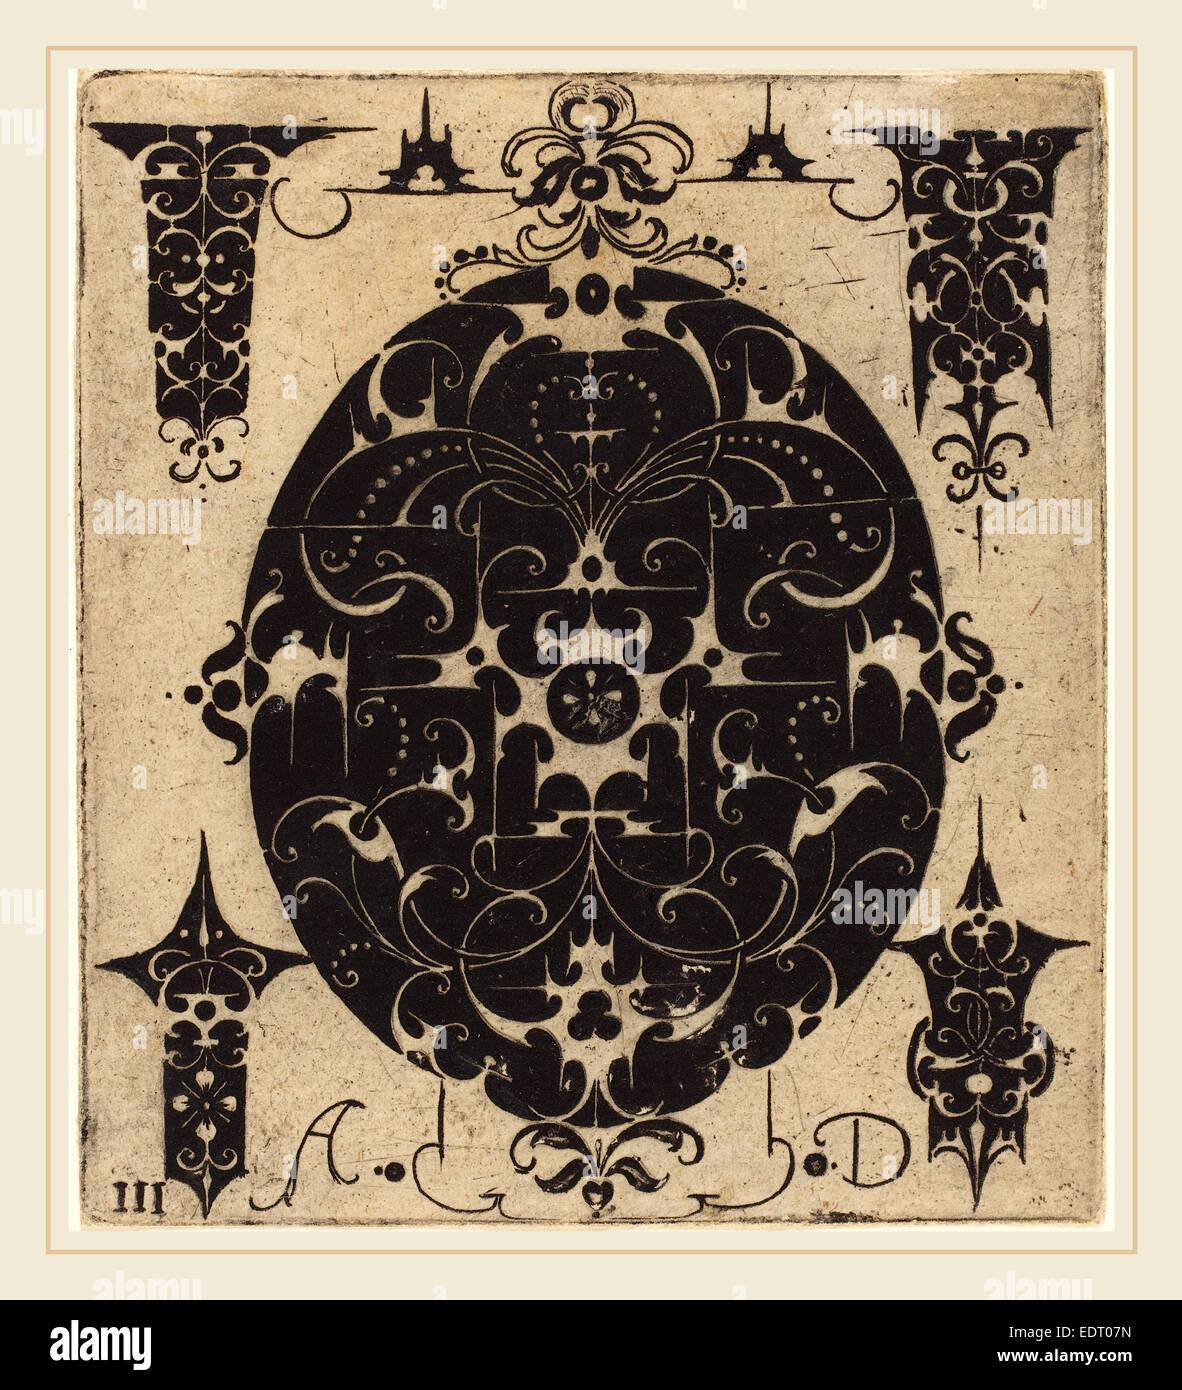 Master AD (Active allemande, fin du 16e siècle), l'Ornement, gravure Photo Stock